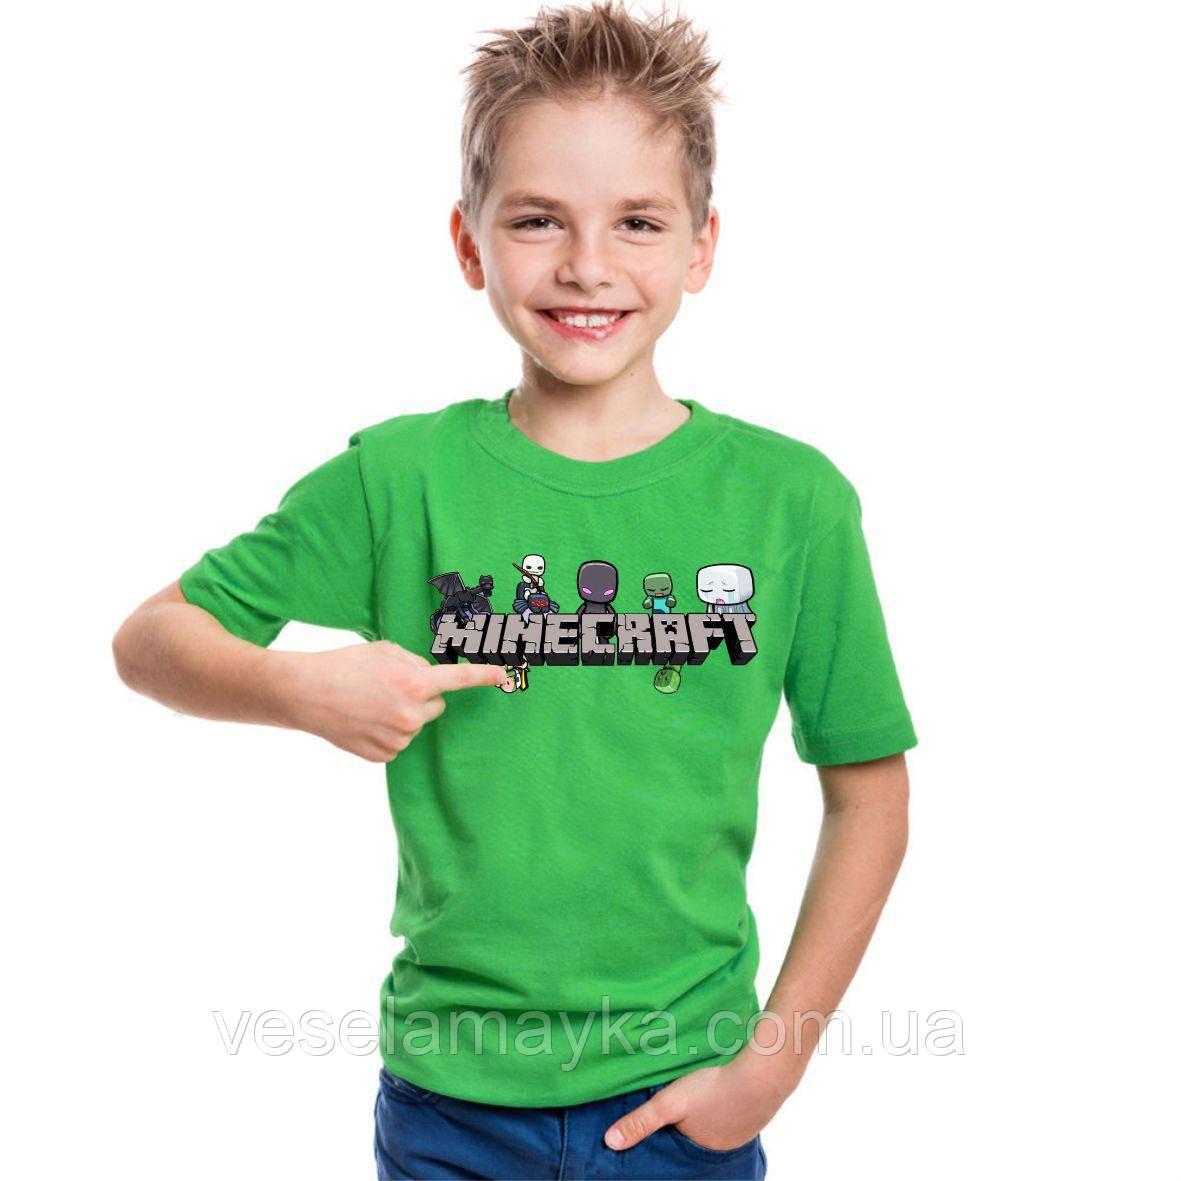 Детская футболка Minecraft 6 (Майнкрафт)